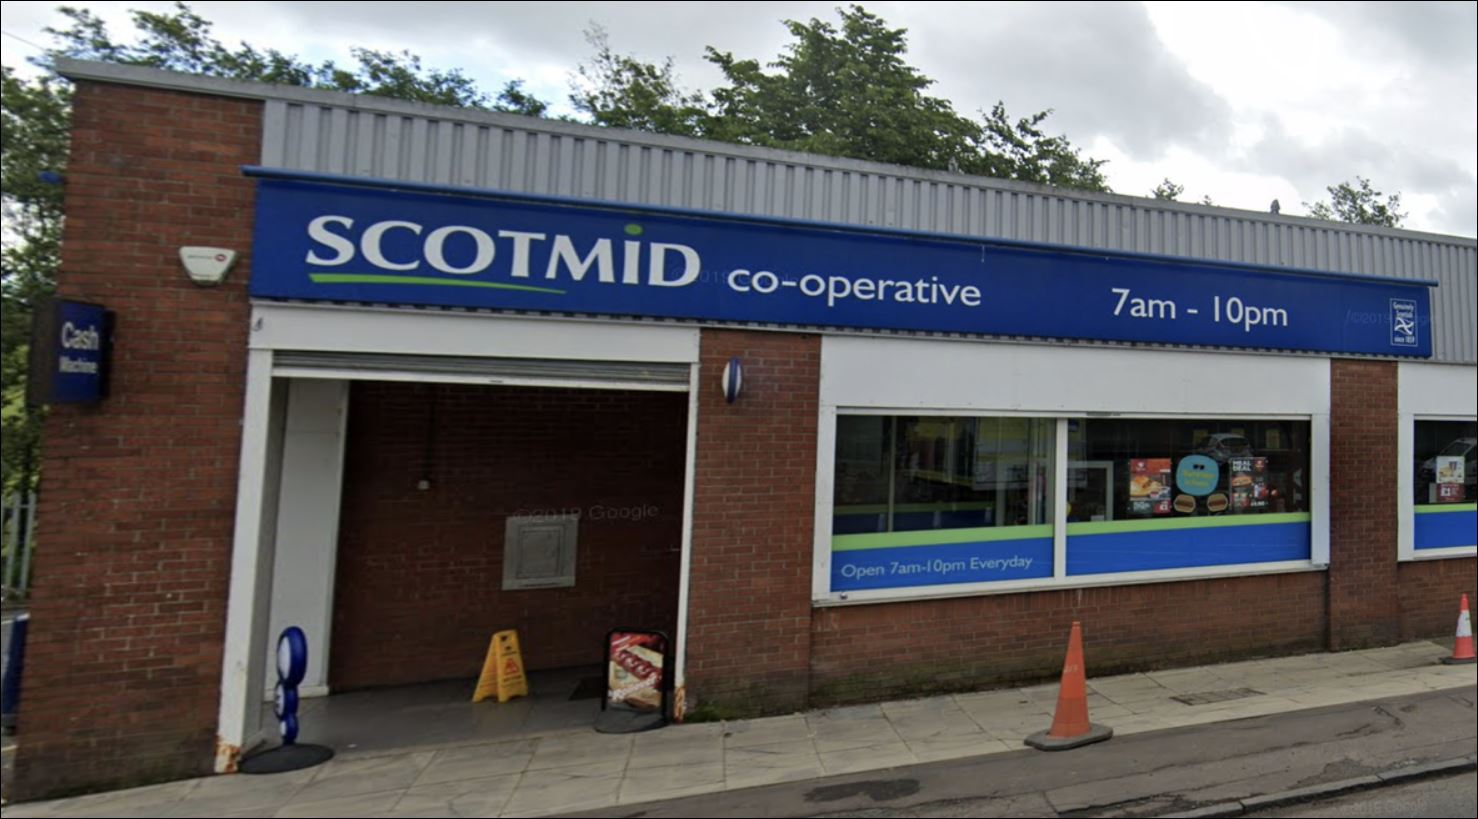 Scotmid Co-operative Customer Feedback Survey